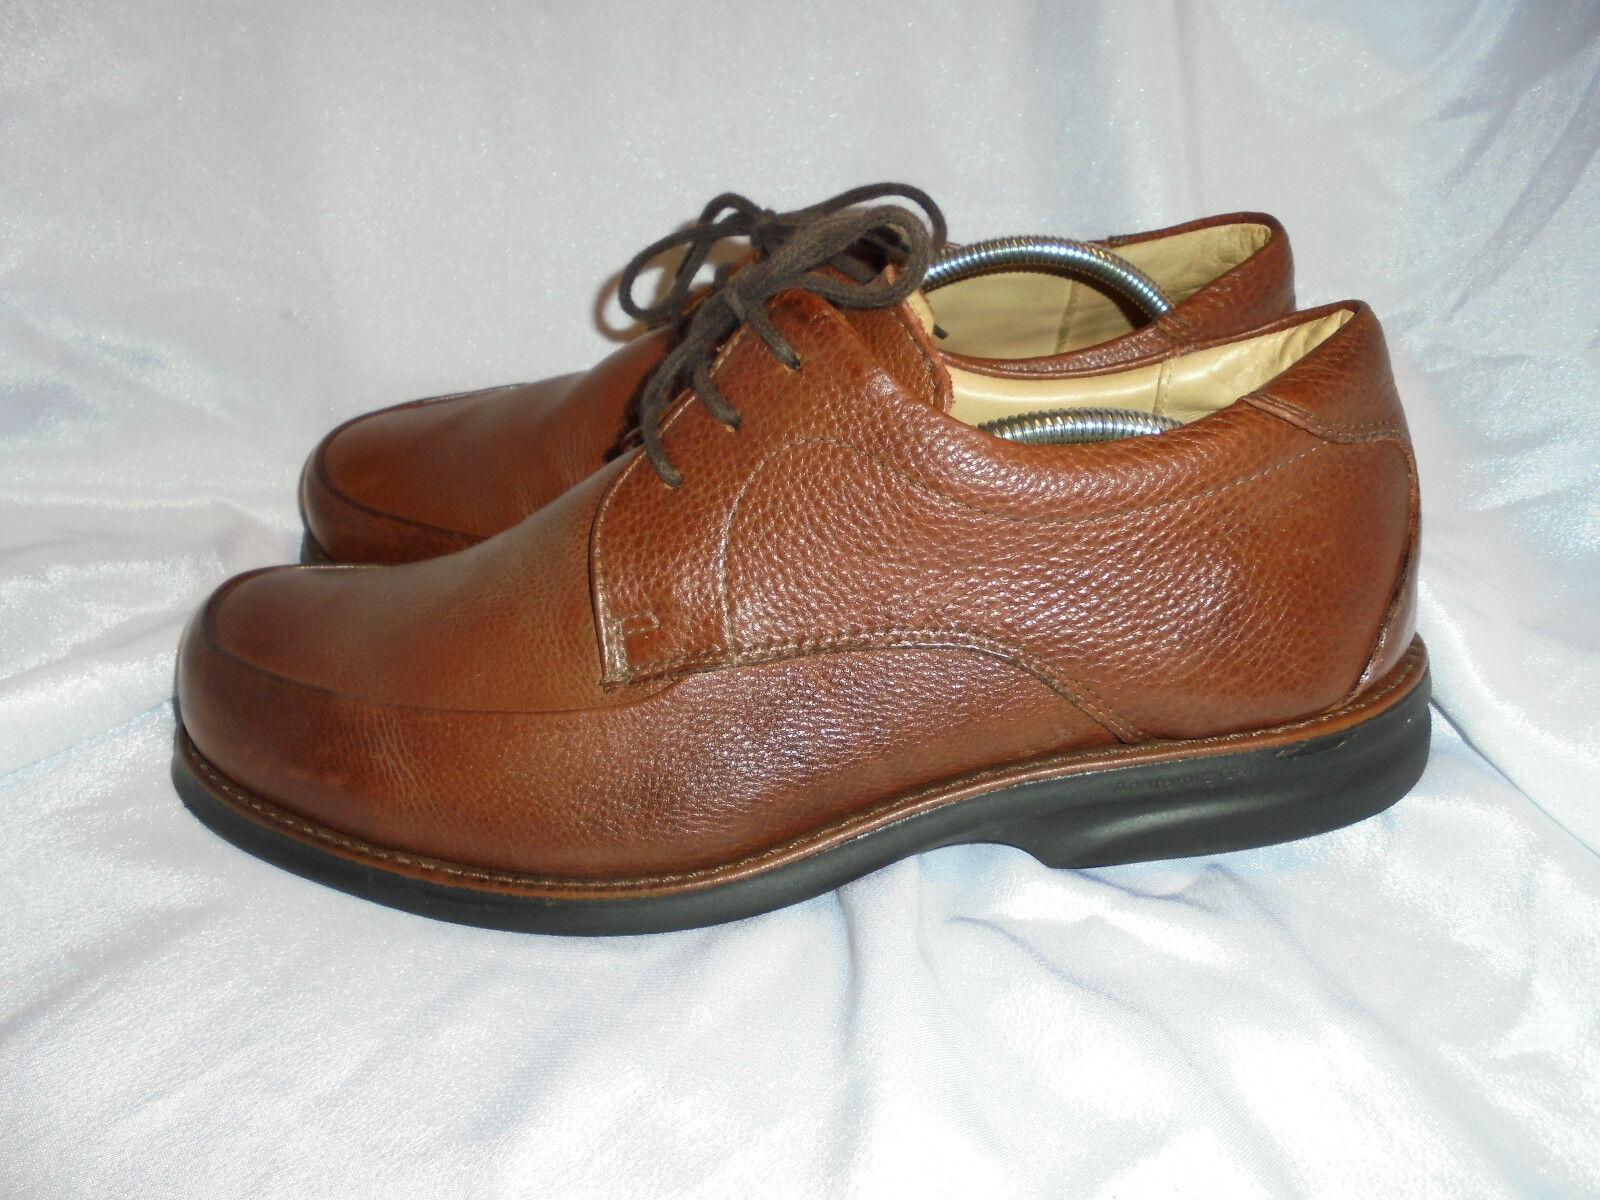 ANATOMIC & CO MEN'S BROWN LEATHER  LACE UP Schuhe 44 SIZE UK 10 EU 44 Schuhe VGC 50a25a